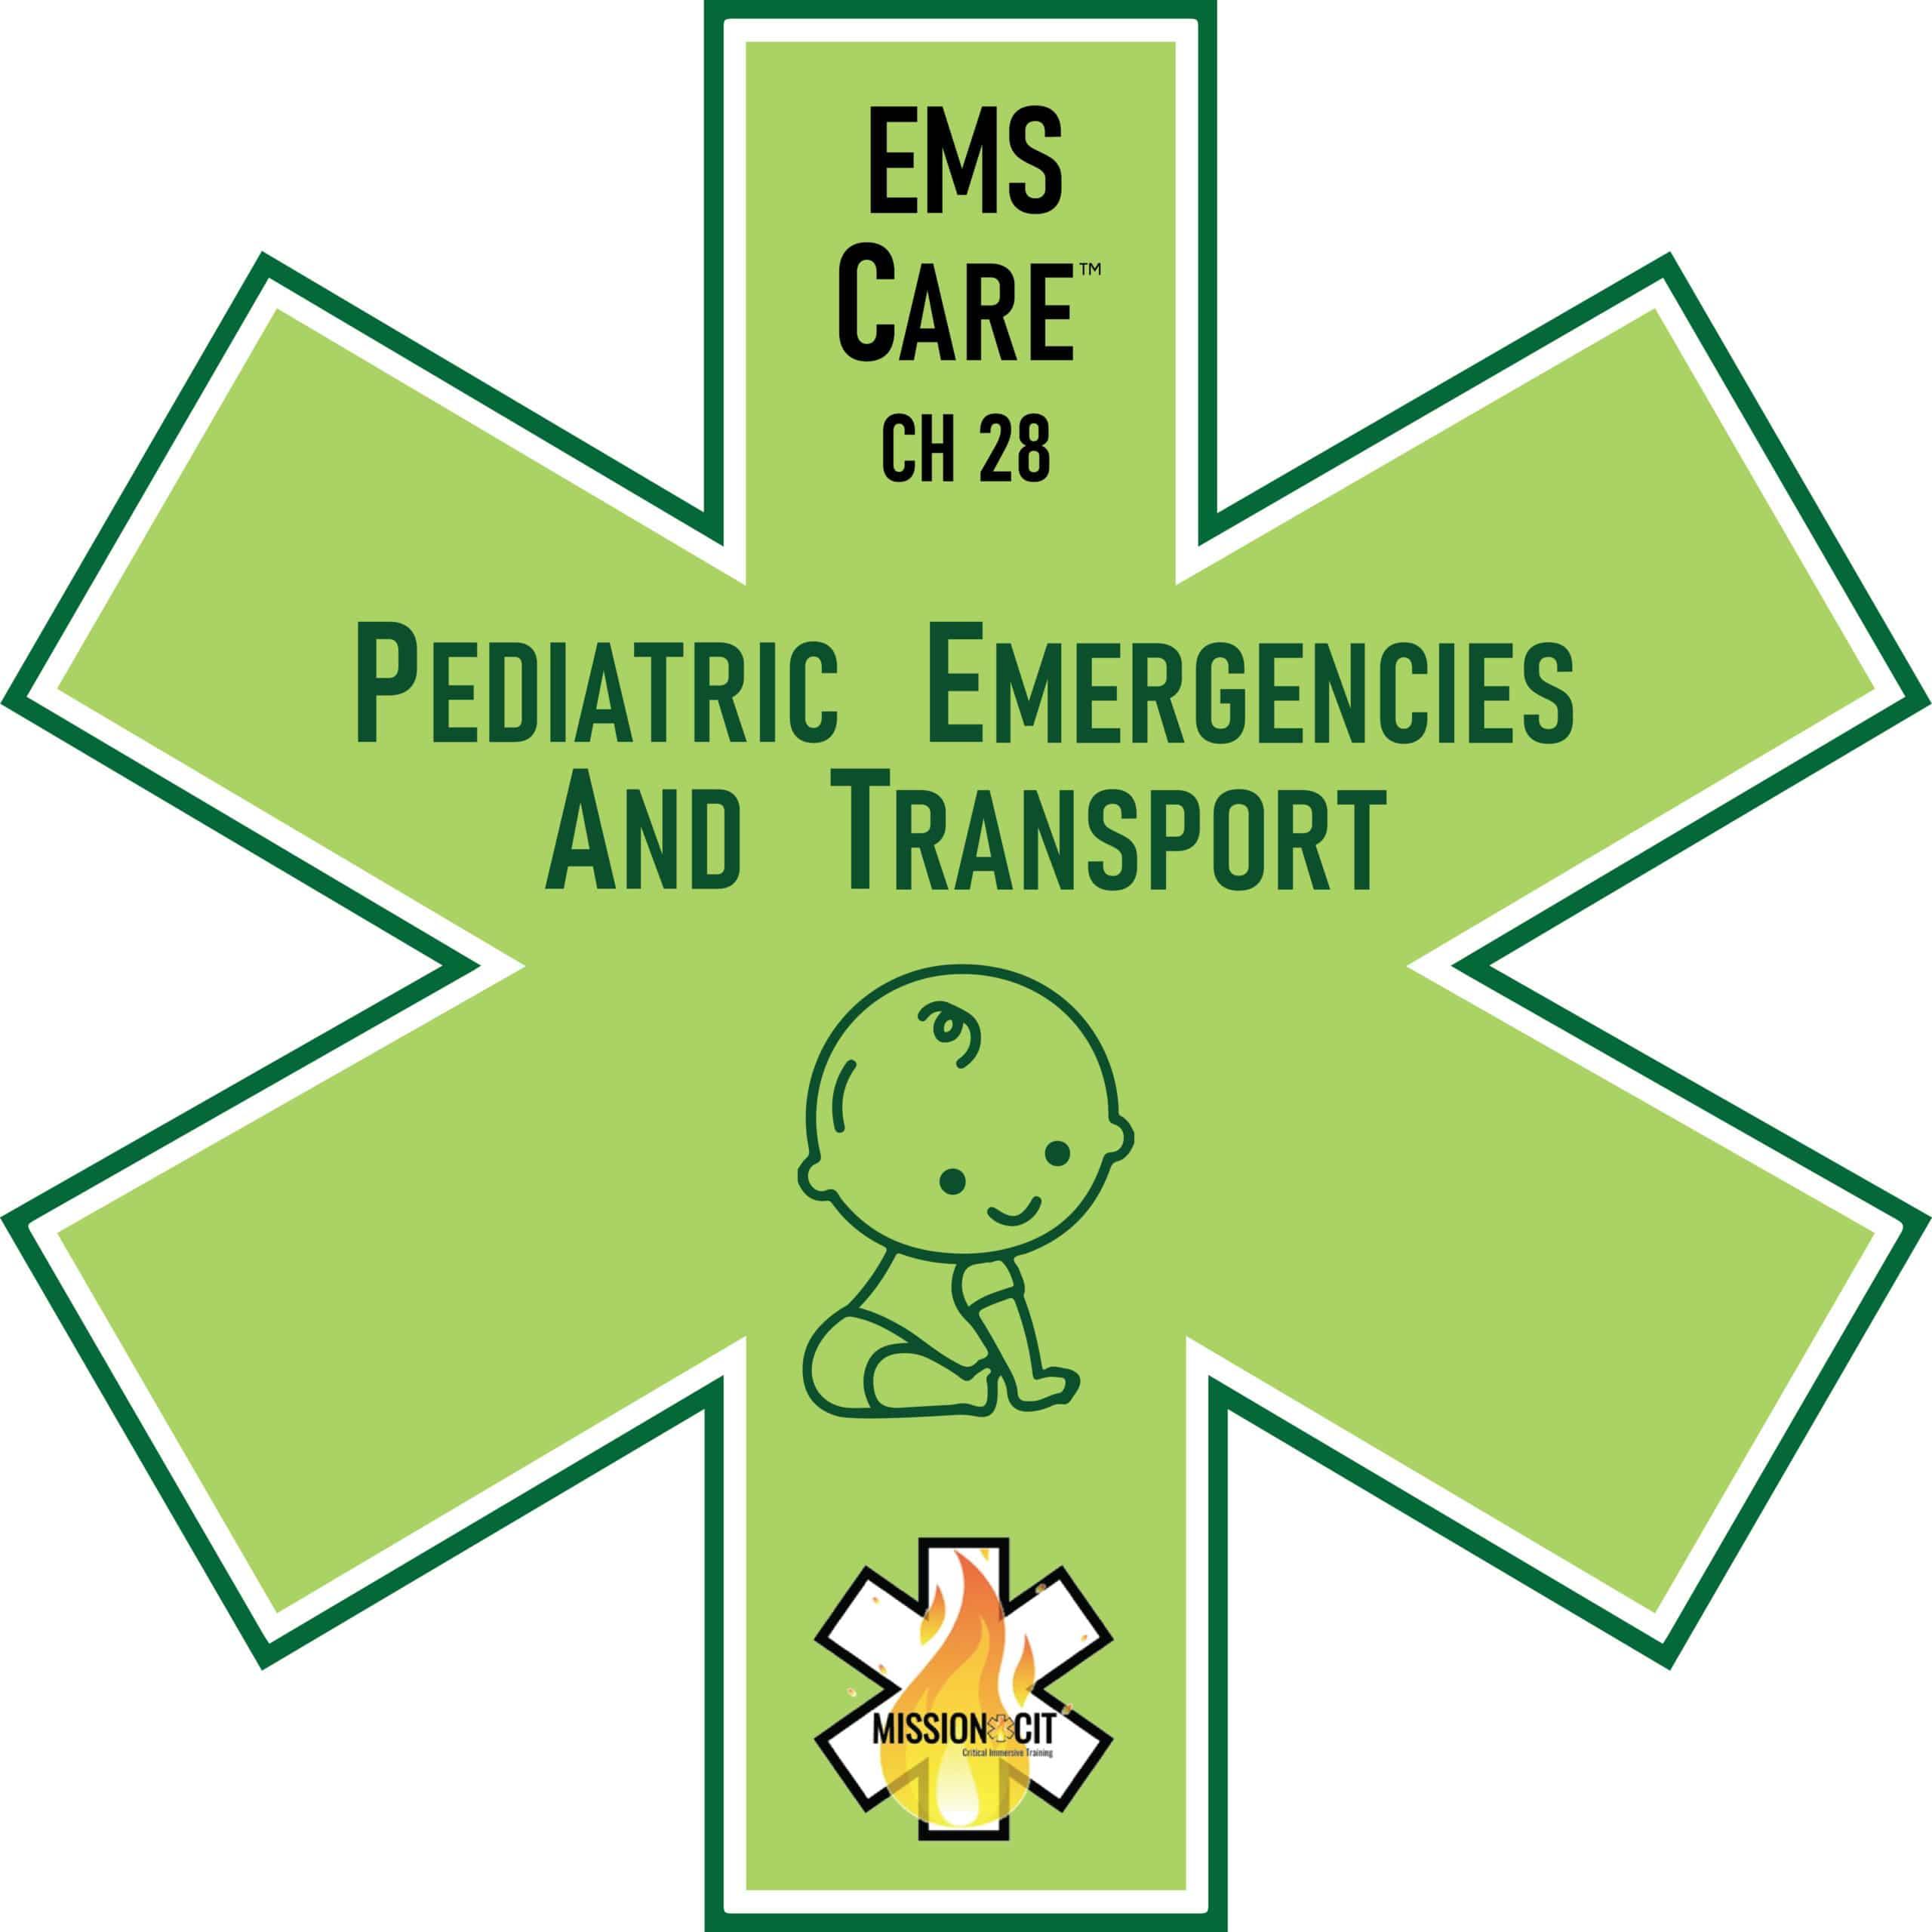 EMS Care Chapter 28 | Pediatric Emergencies EMT | Pediatric Transport | Pediatric Airway Differences | Pediatric Respiratory System